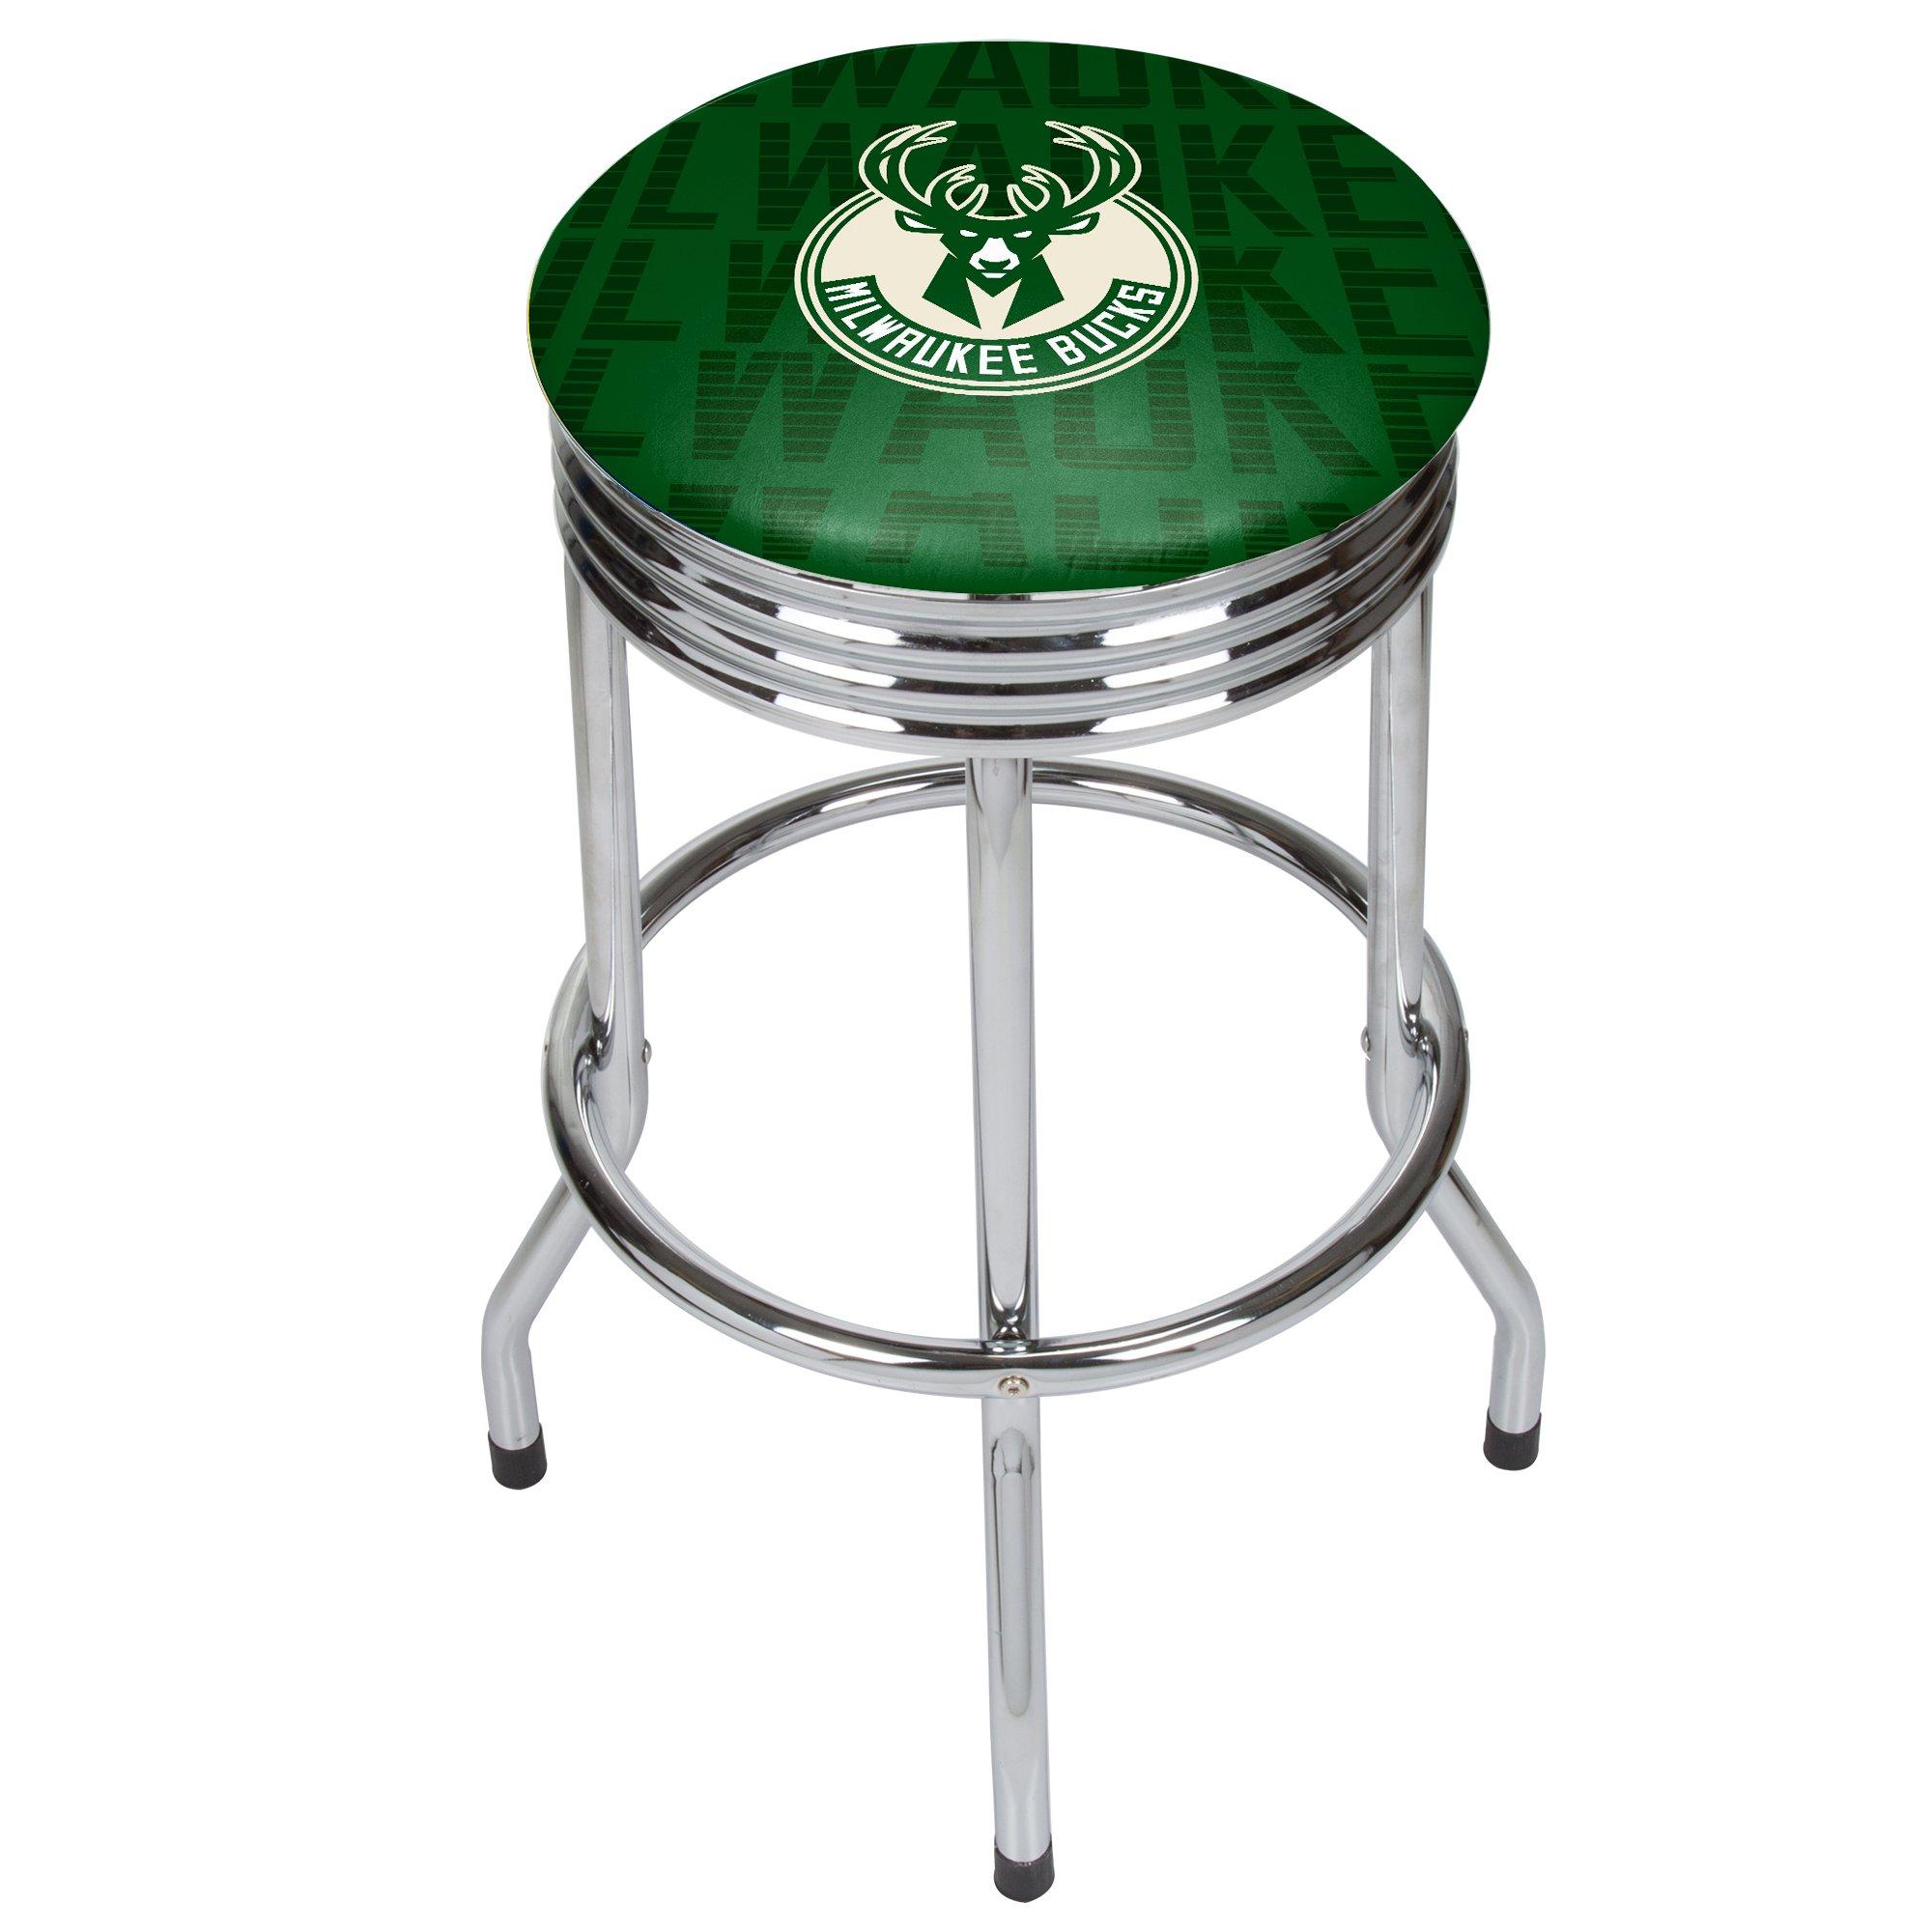 Trademark Gameroom NBA1005-MB3 NBA Chrome Ribbed bar Stool - City - Milwaulkee Bucks